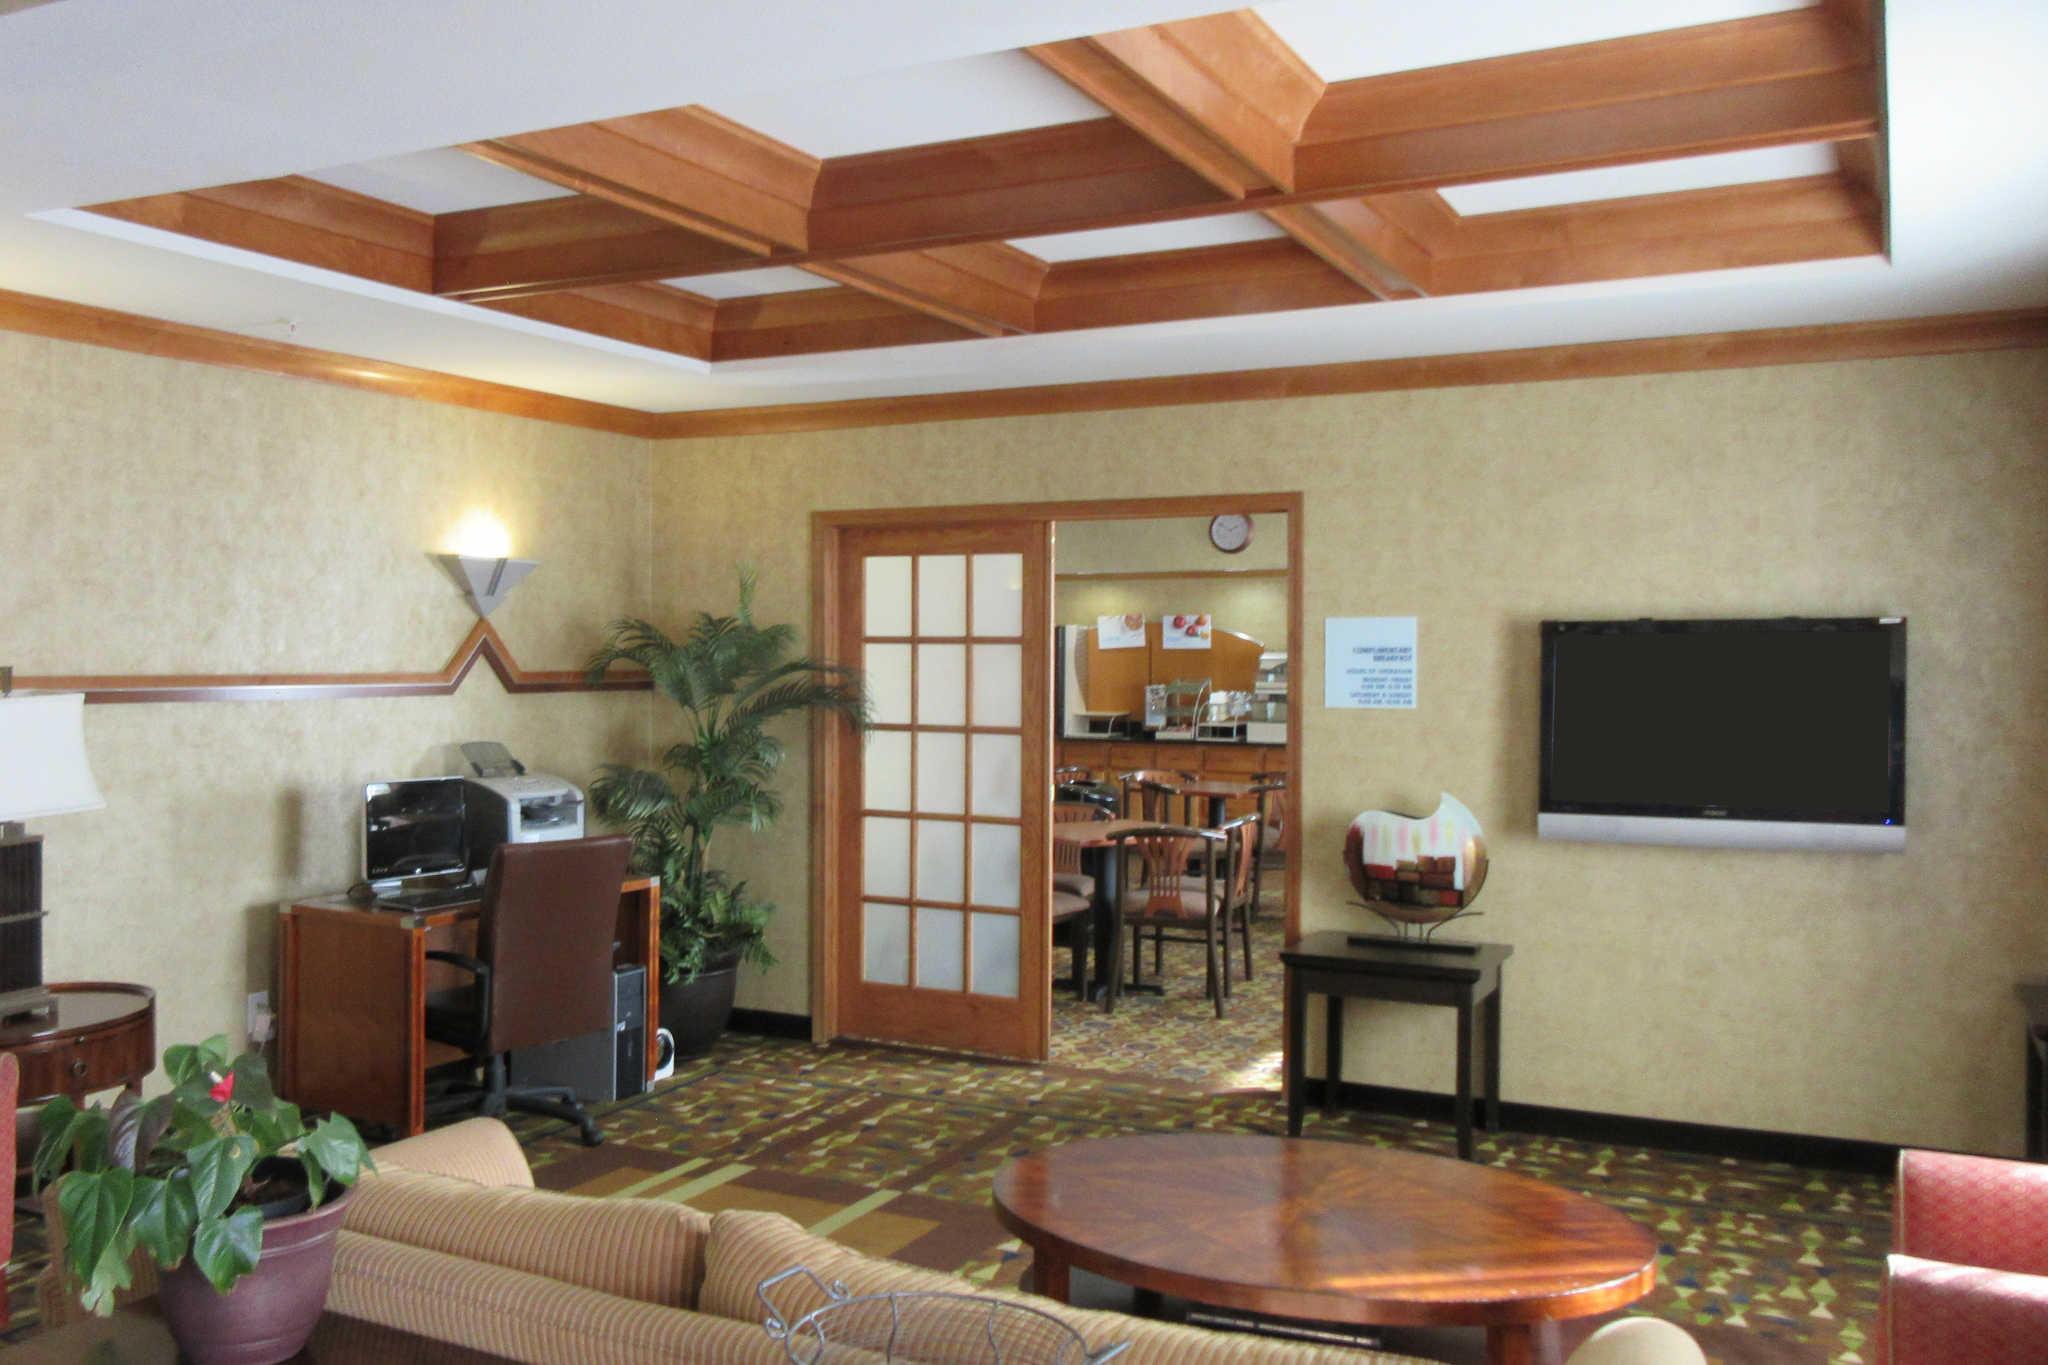 Clarion Inn & Suites image 1